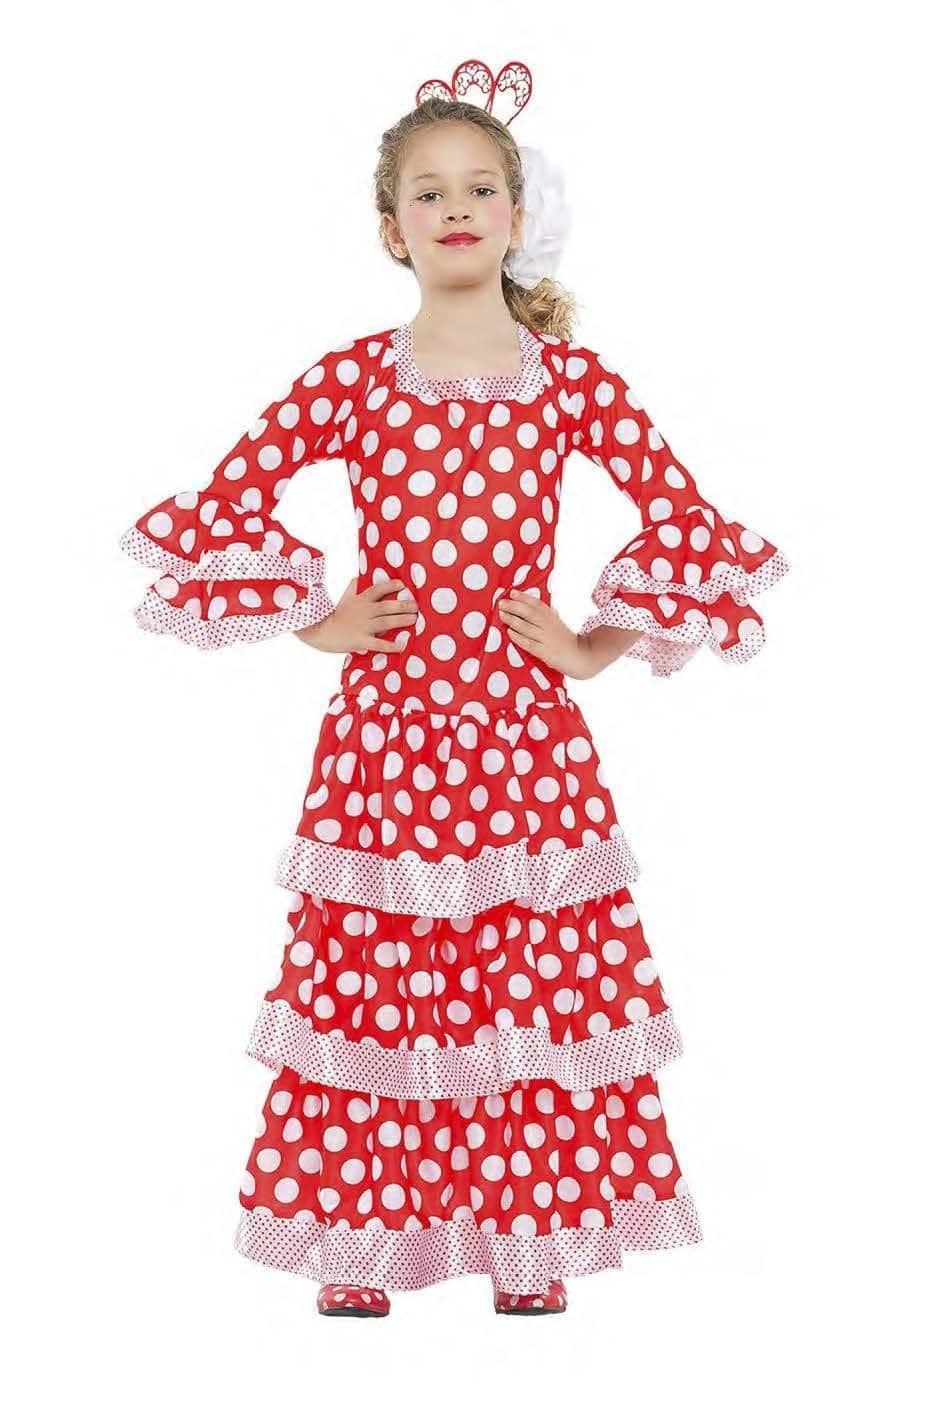 disfraz-traje-sevillana-flamenca-andaluza-nina-5-6-anos-feria-abril